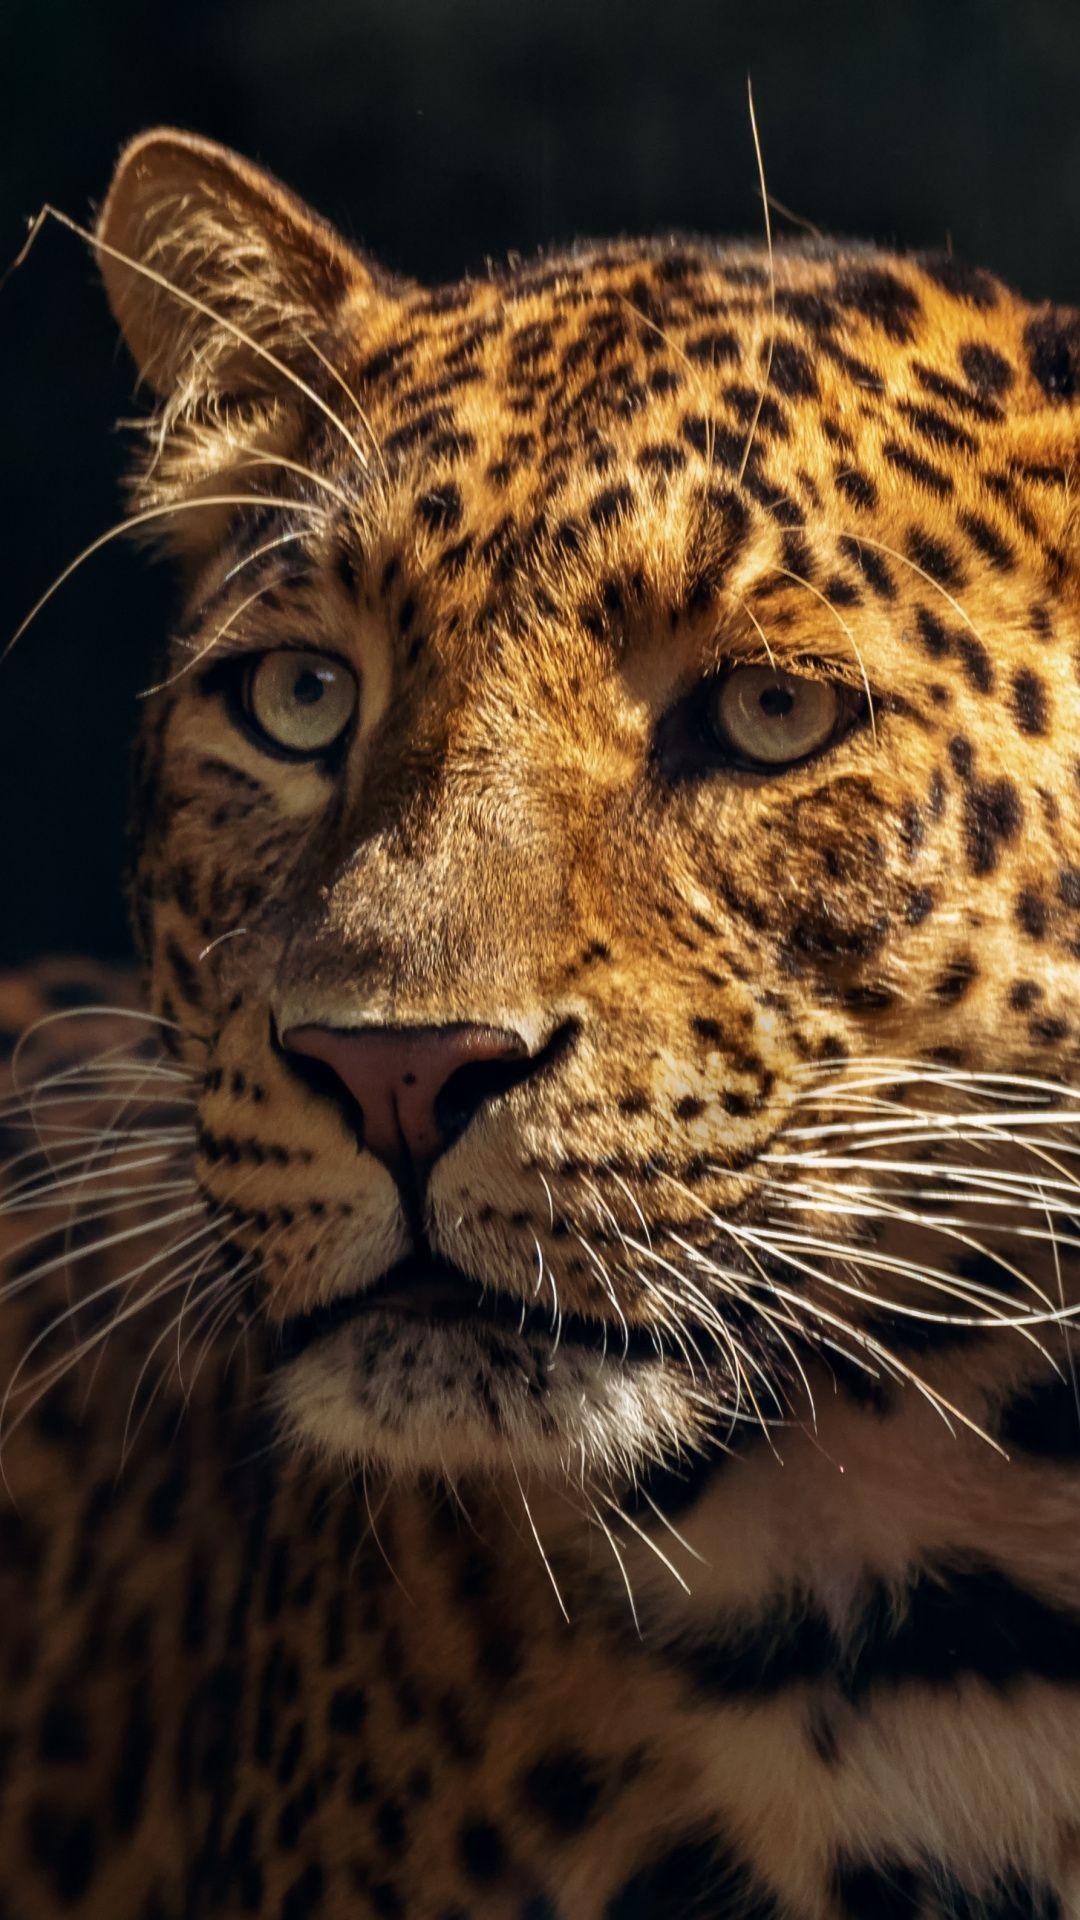 Zoo Wildlife Leopard Muzzle 1080x1920 Wallpaper Animal Wallpaper Animals Wallpaper